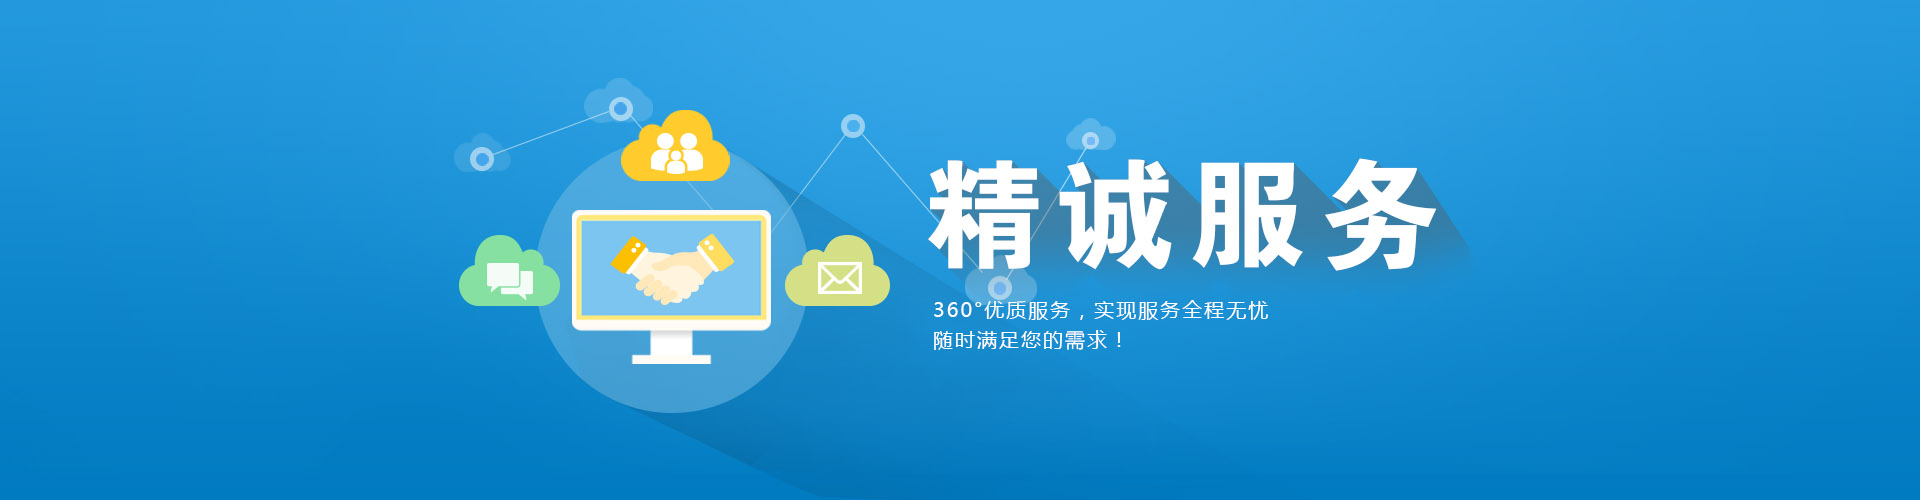 shang用厨房上xiashui设施设计原则banner